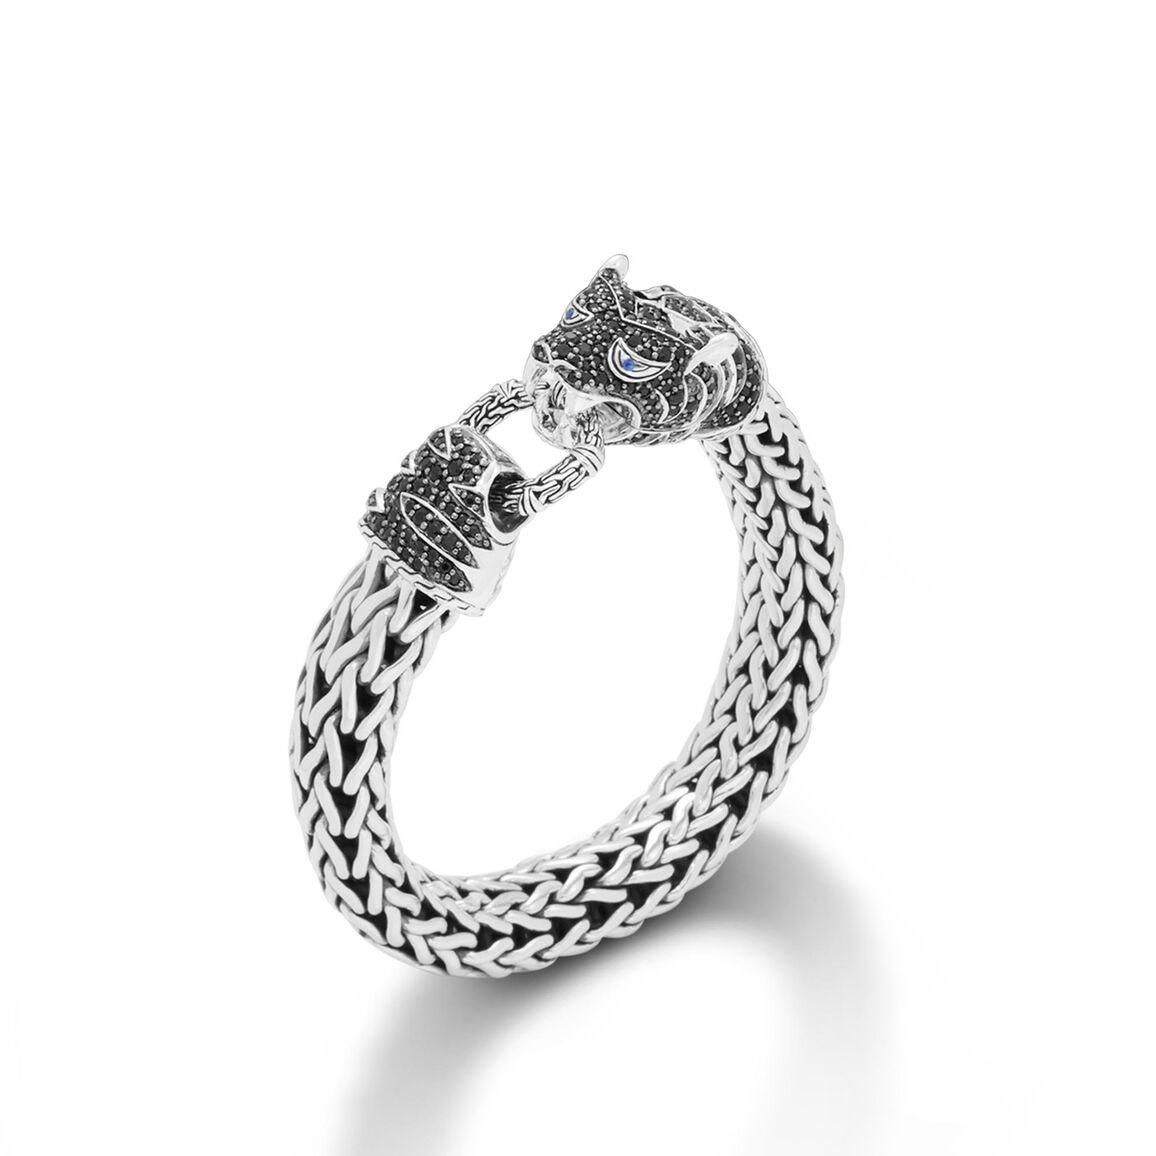 Legends Macan 10.5MM Station Bracelet in Silver, Gemstone